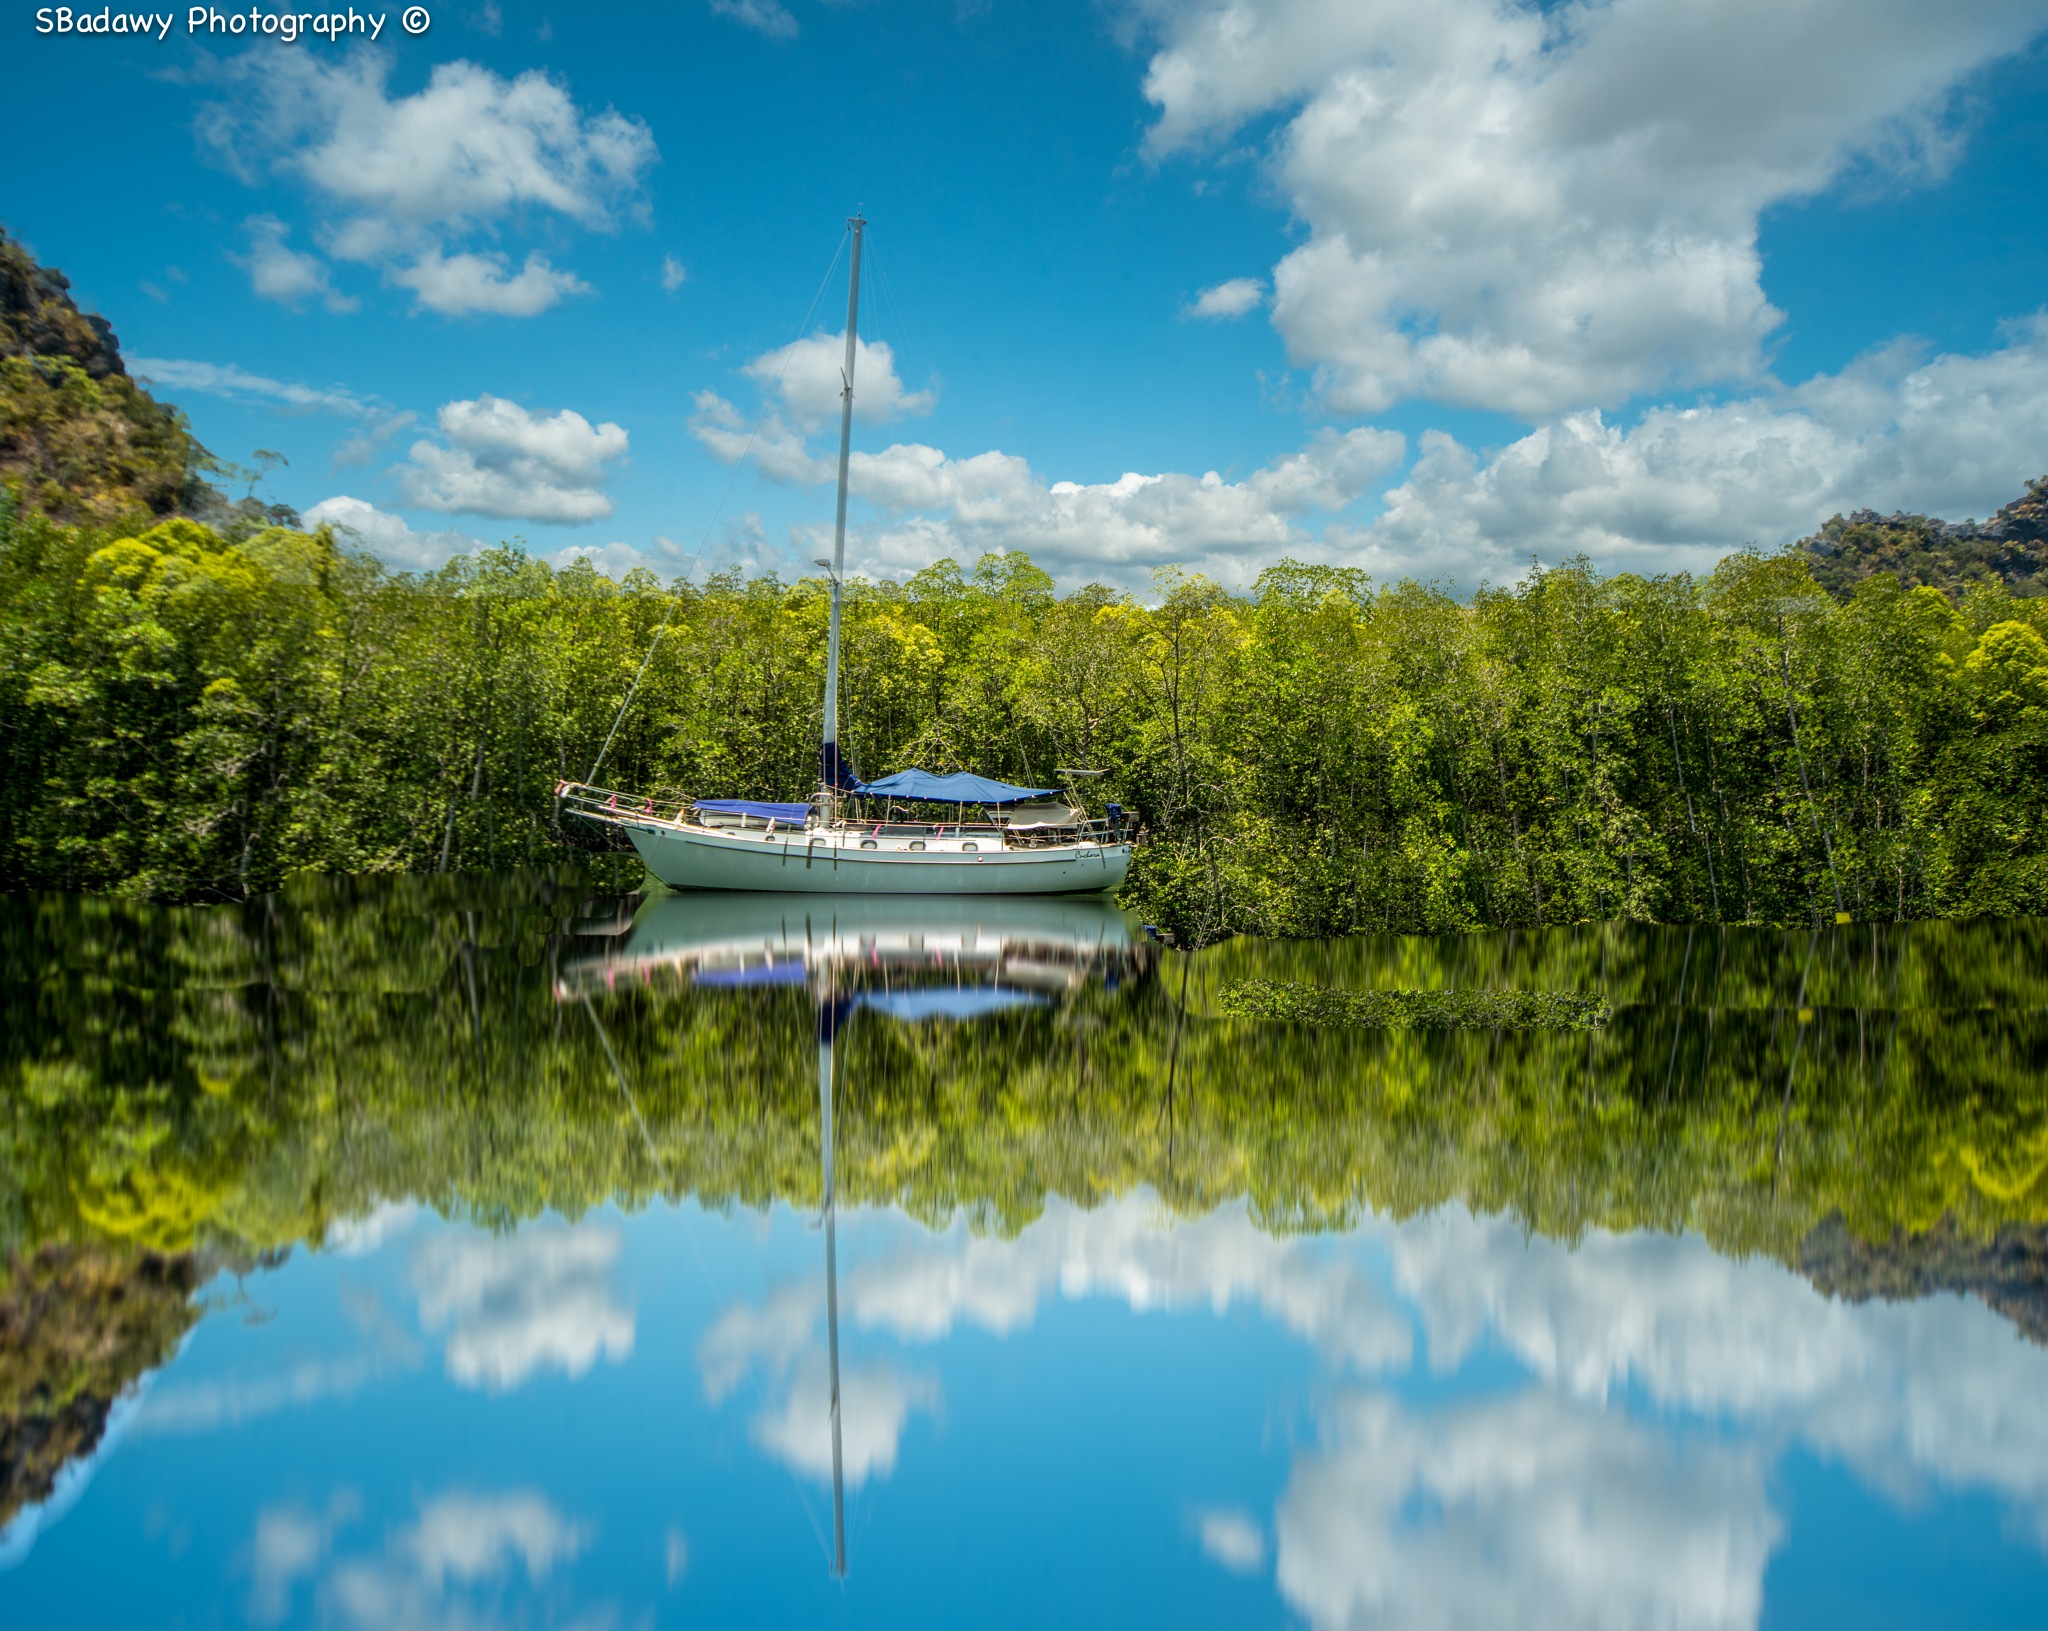 Reflection  by Sherif Badawy